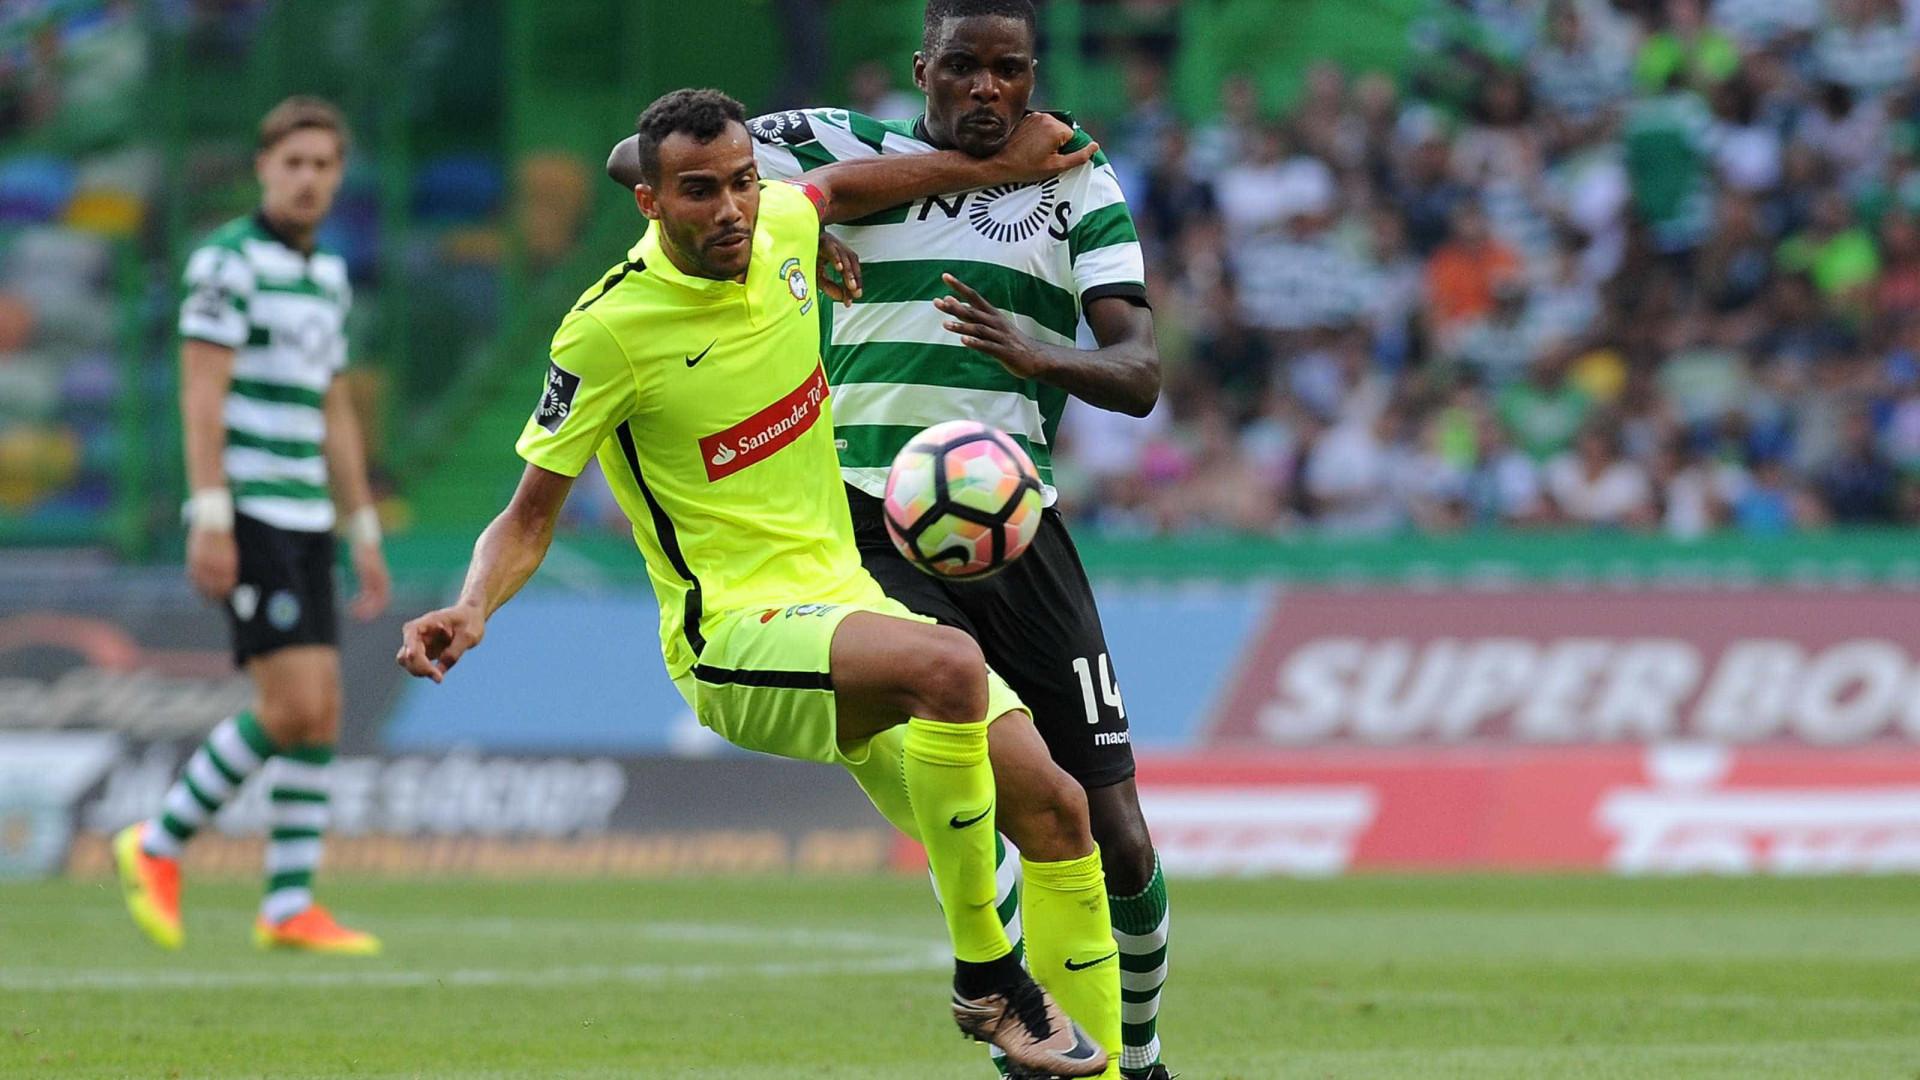 Fransérgio considera que Sp. Braga está preparado para Liga Europa